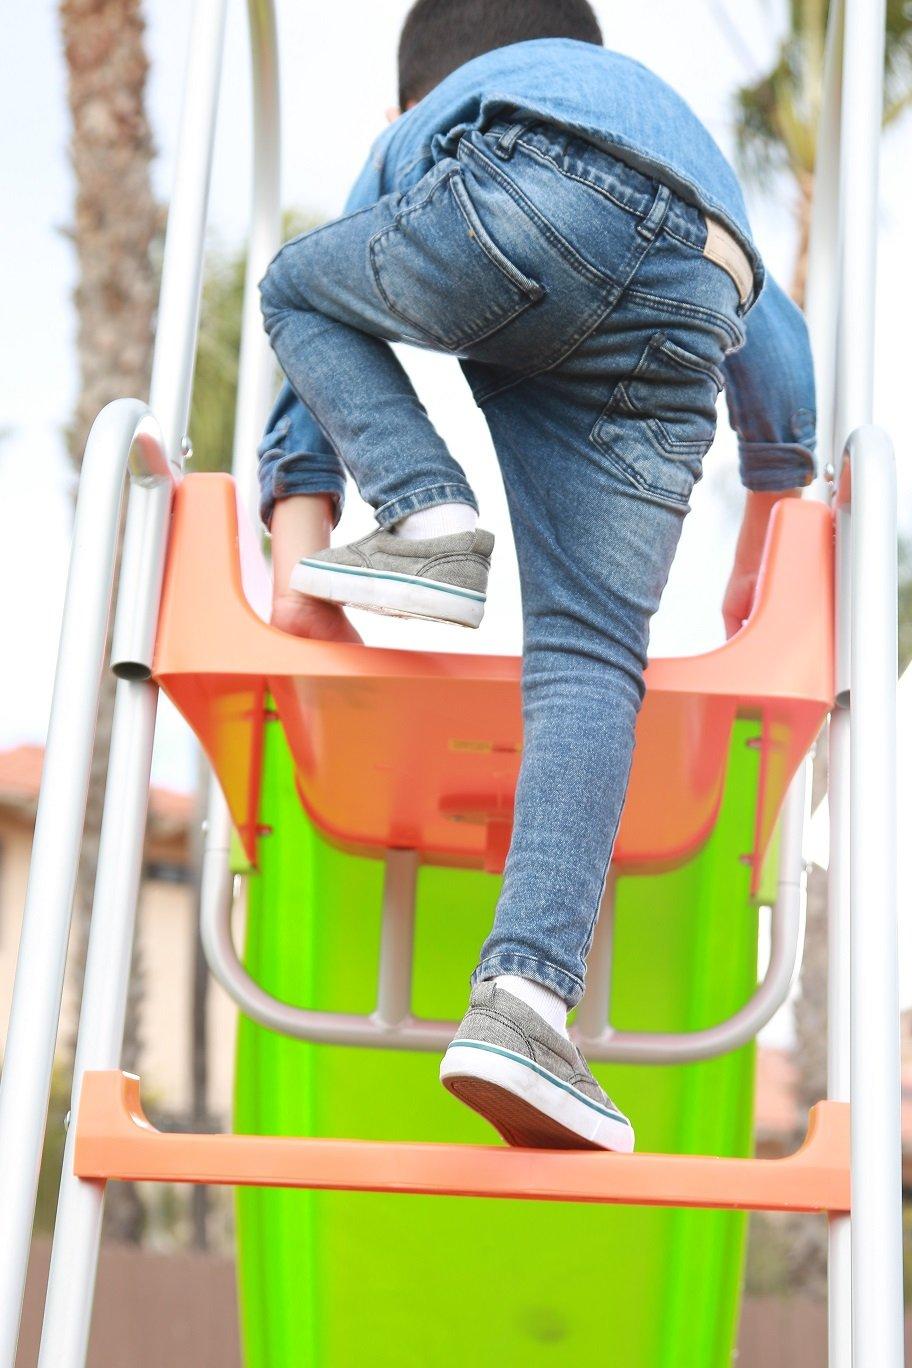 SLIDEWHIZZER Outdoor Play Set Kids Slide: 10 ft Freestanding Climber, Swingsets, Playground Jungle Gyms Kids Love - Above Ground Pool Slide for Summer Backyard by SLIDEWHIZZER (Image #8)